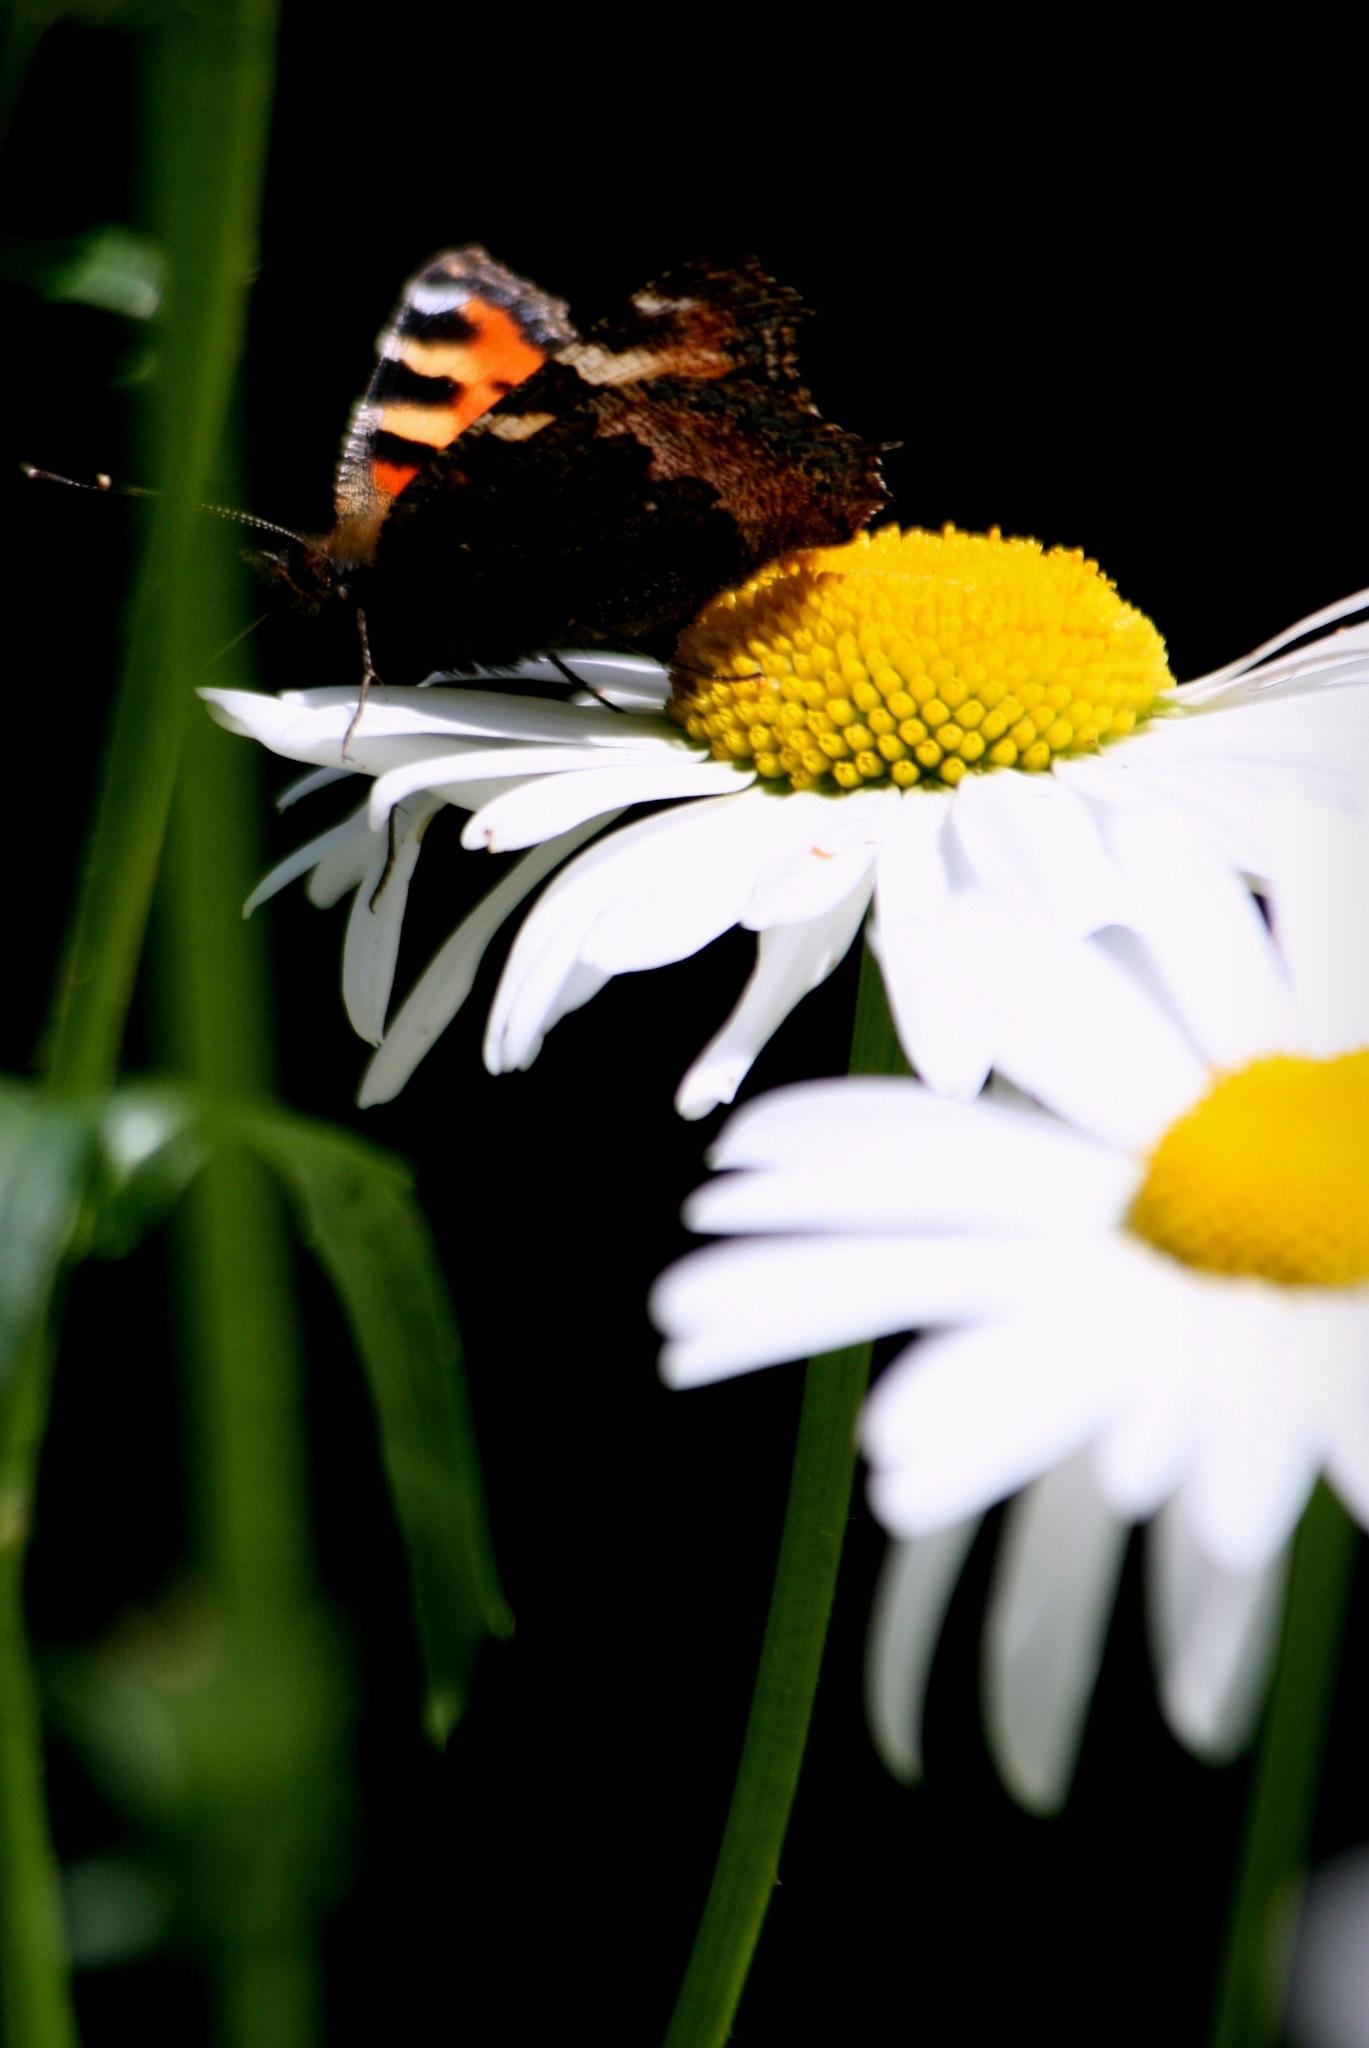 momentum in flower by antsatykkylainen